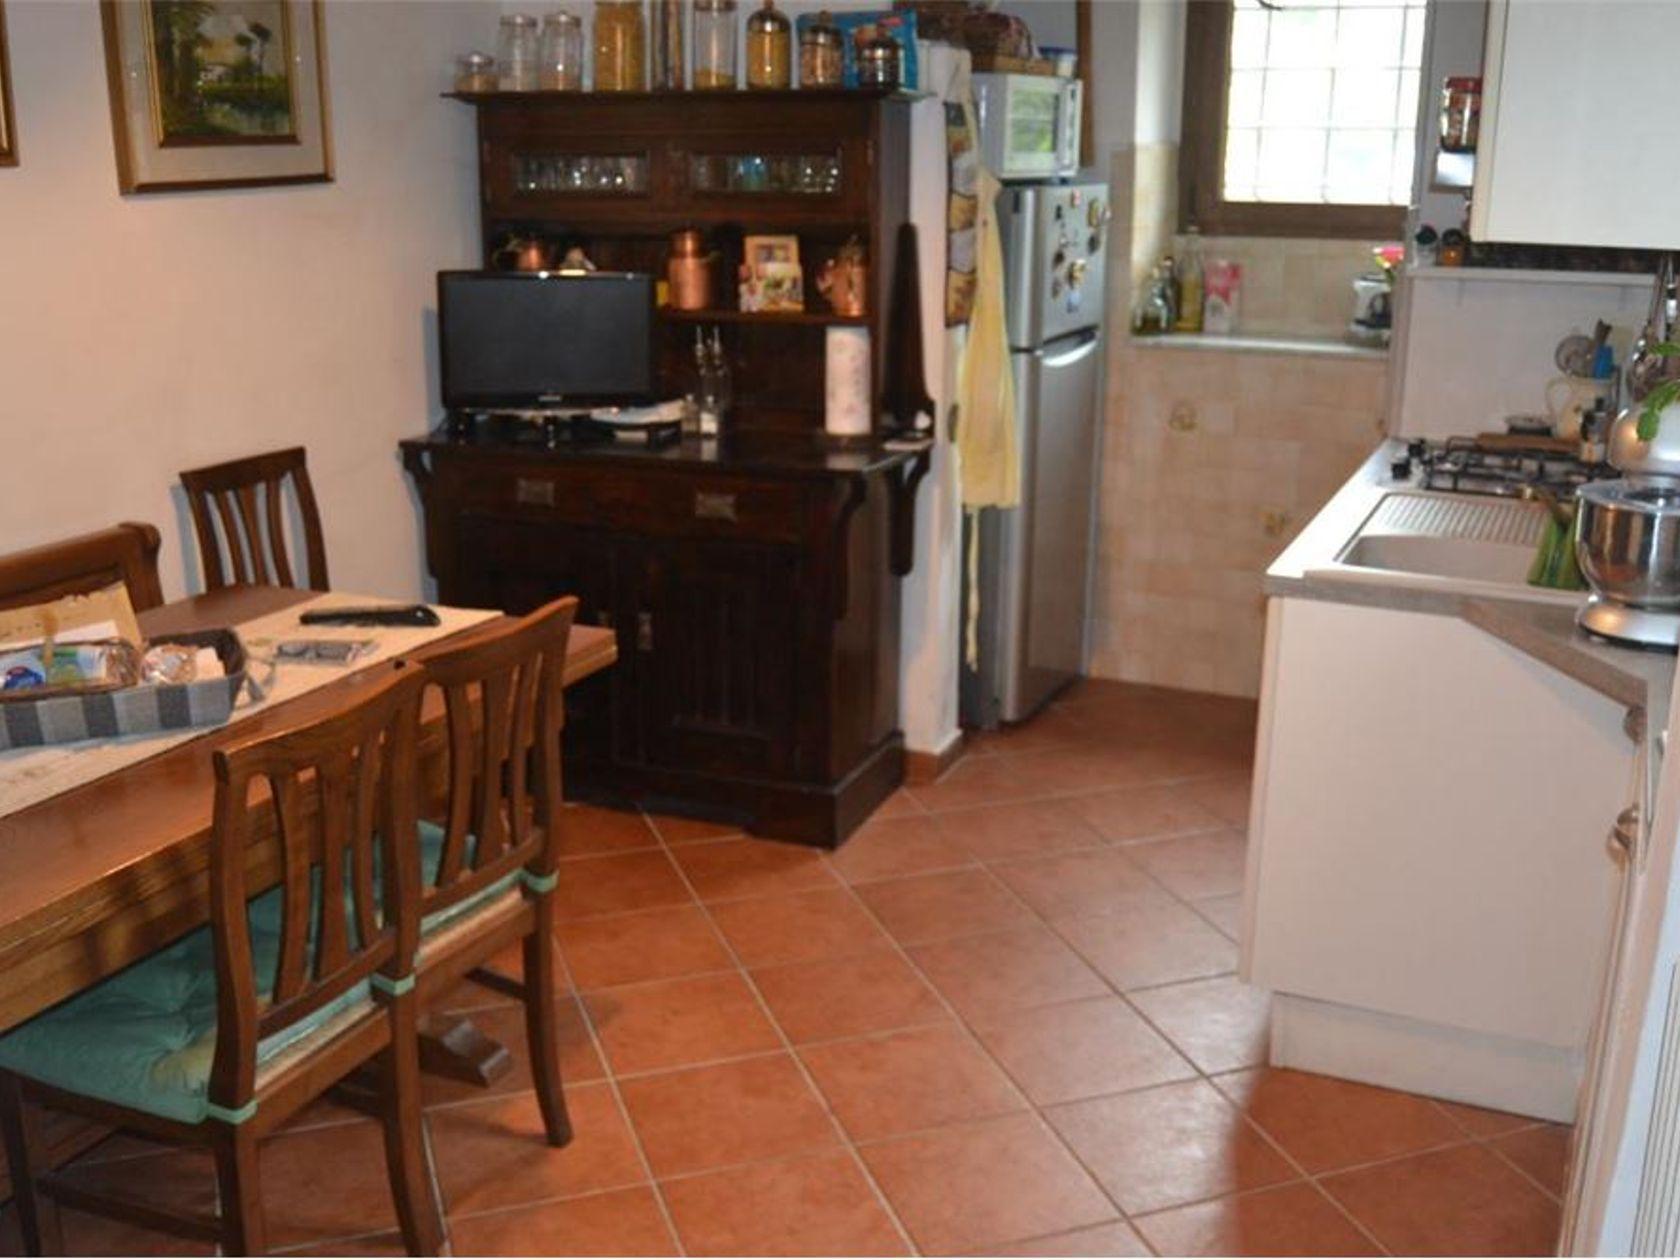 Appartamento Firenze - Firenze Sud Gavinana Europa, Firenze, FI Vendita